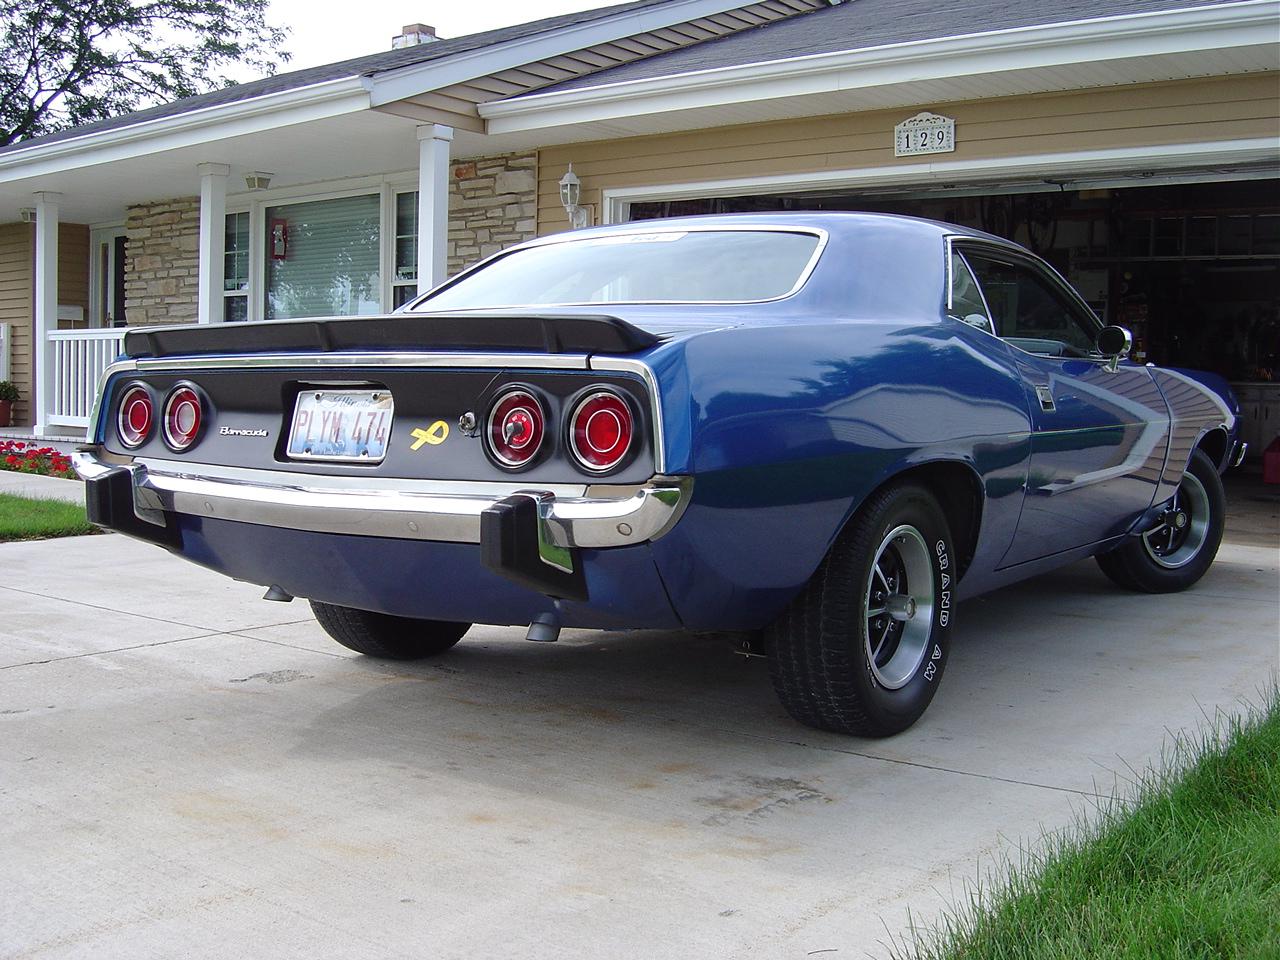 barracuda car 1974 - photo #22